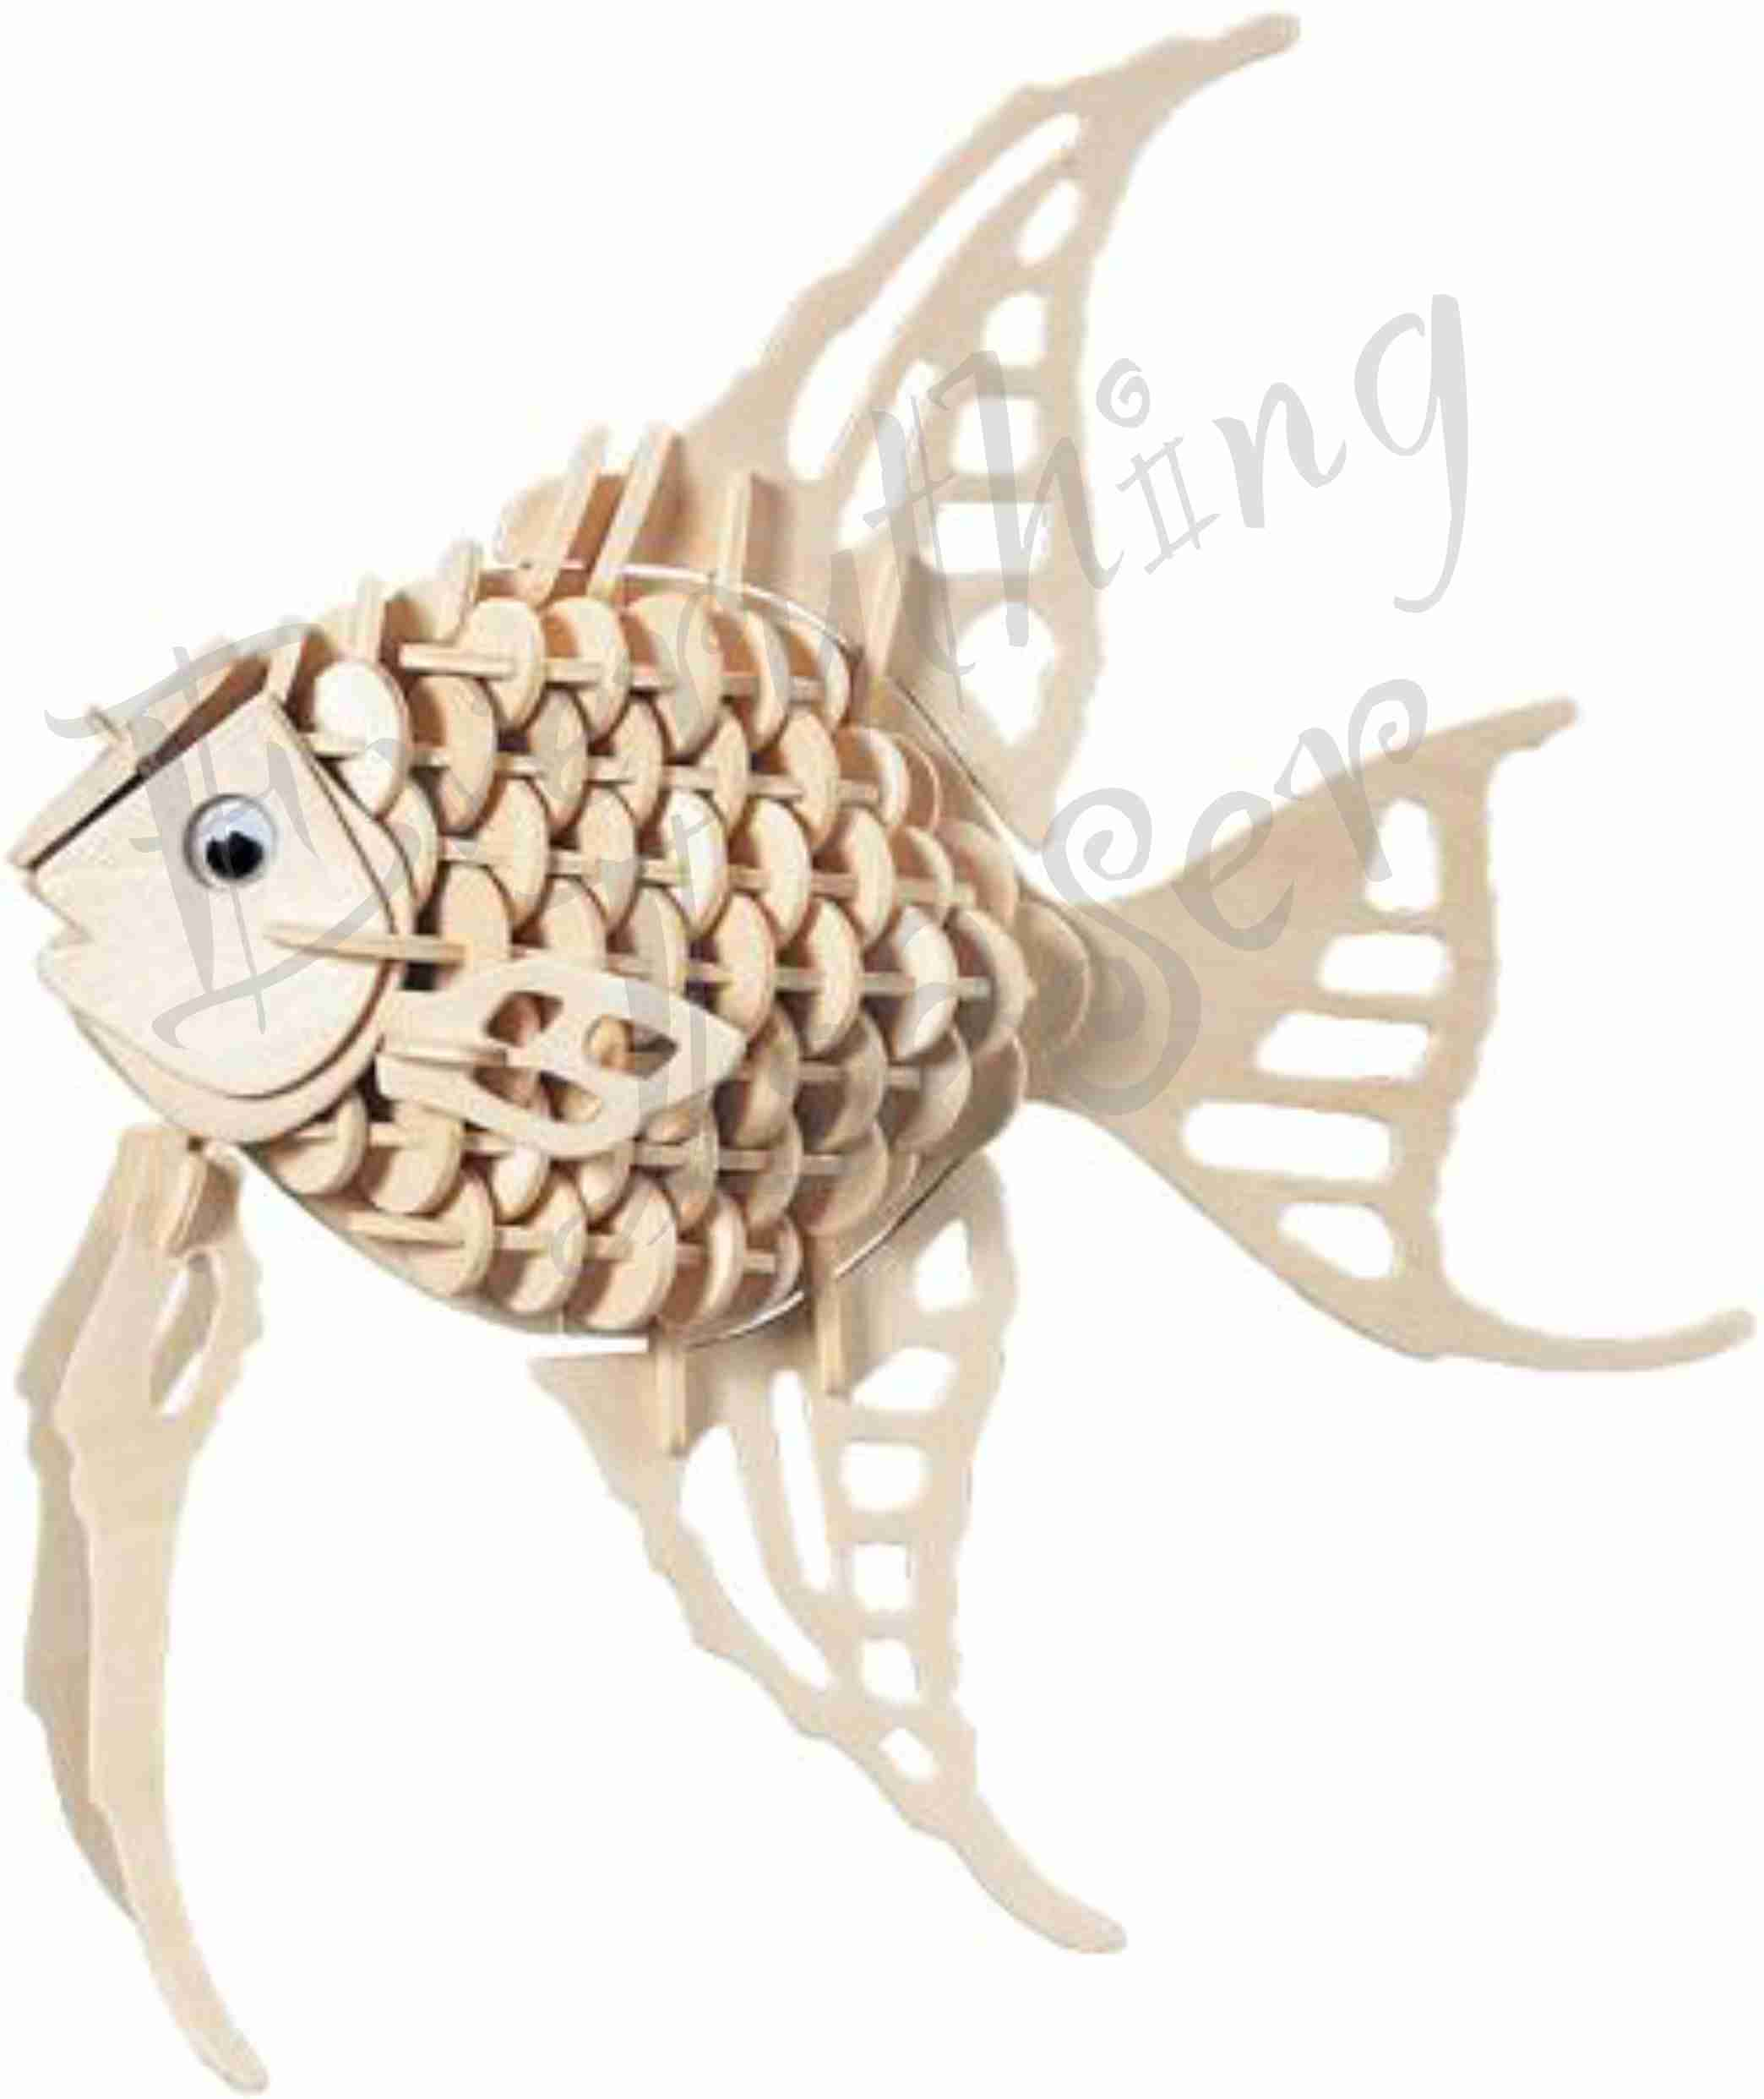 3D Puzzle- Angelfish